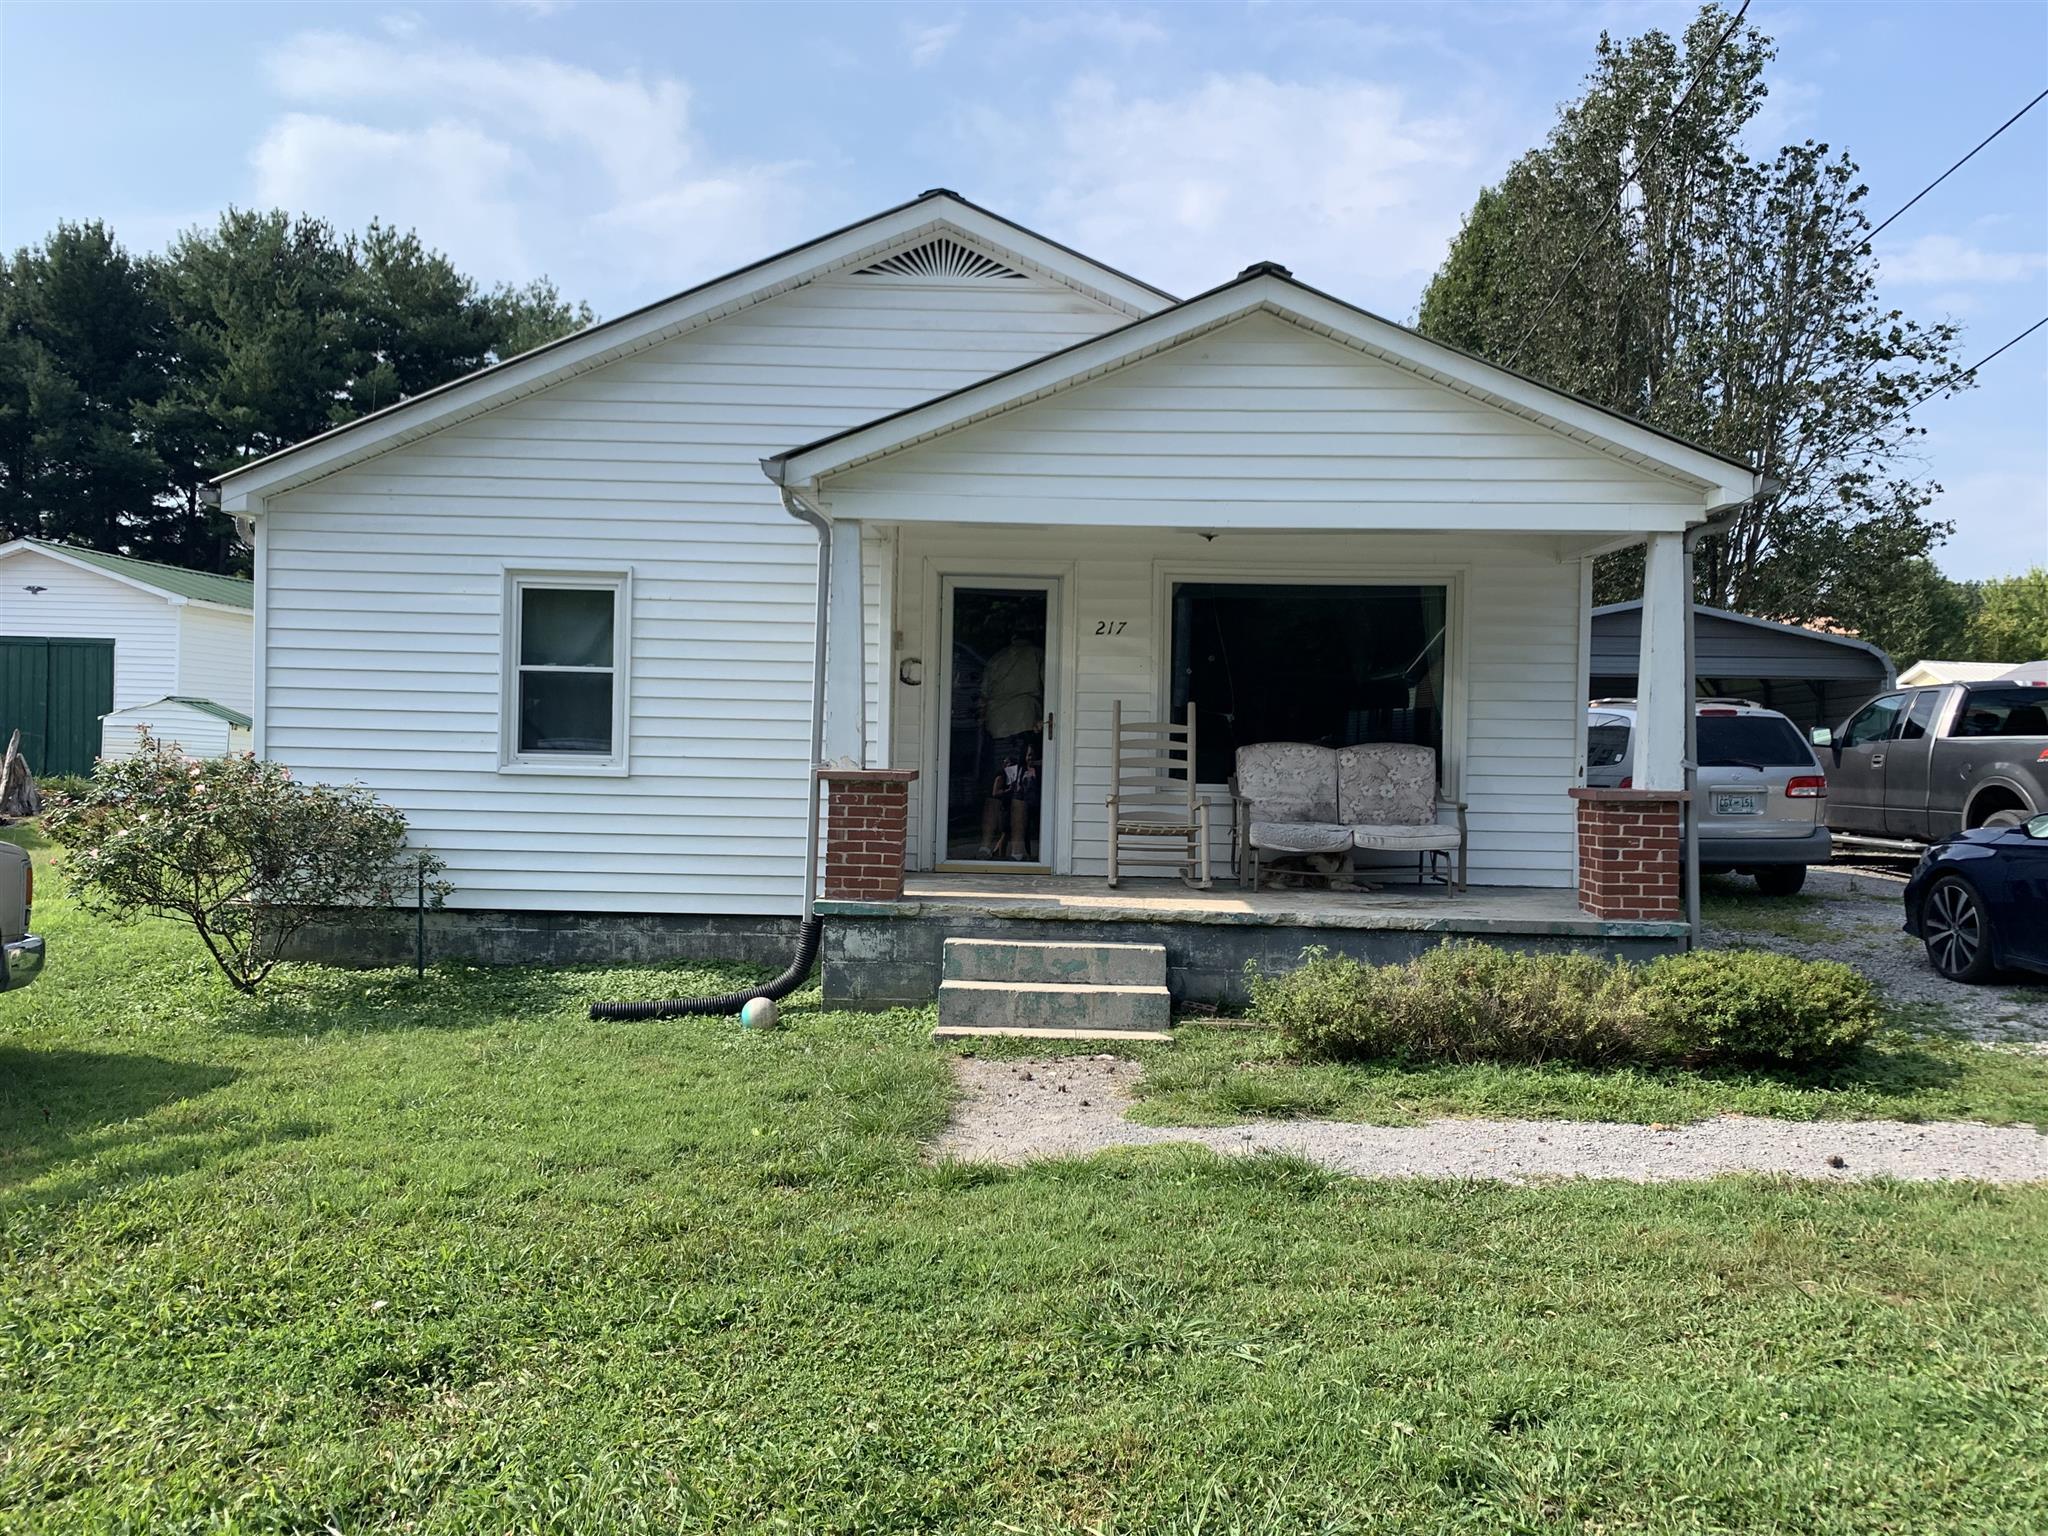 217 Adams St, Smithville, TN 37166 - Smithville, TN real estate listing